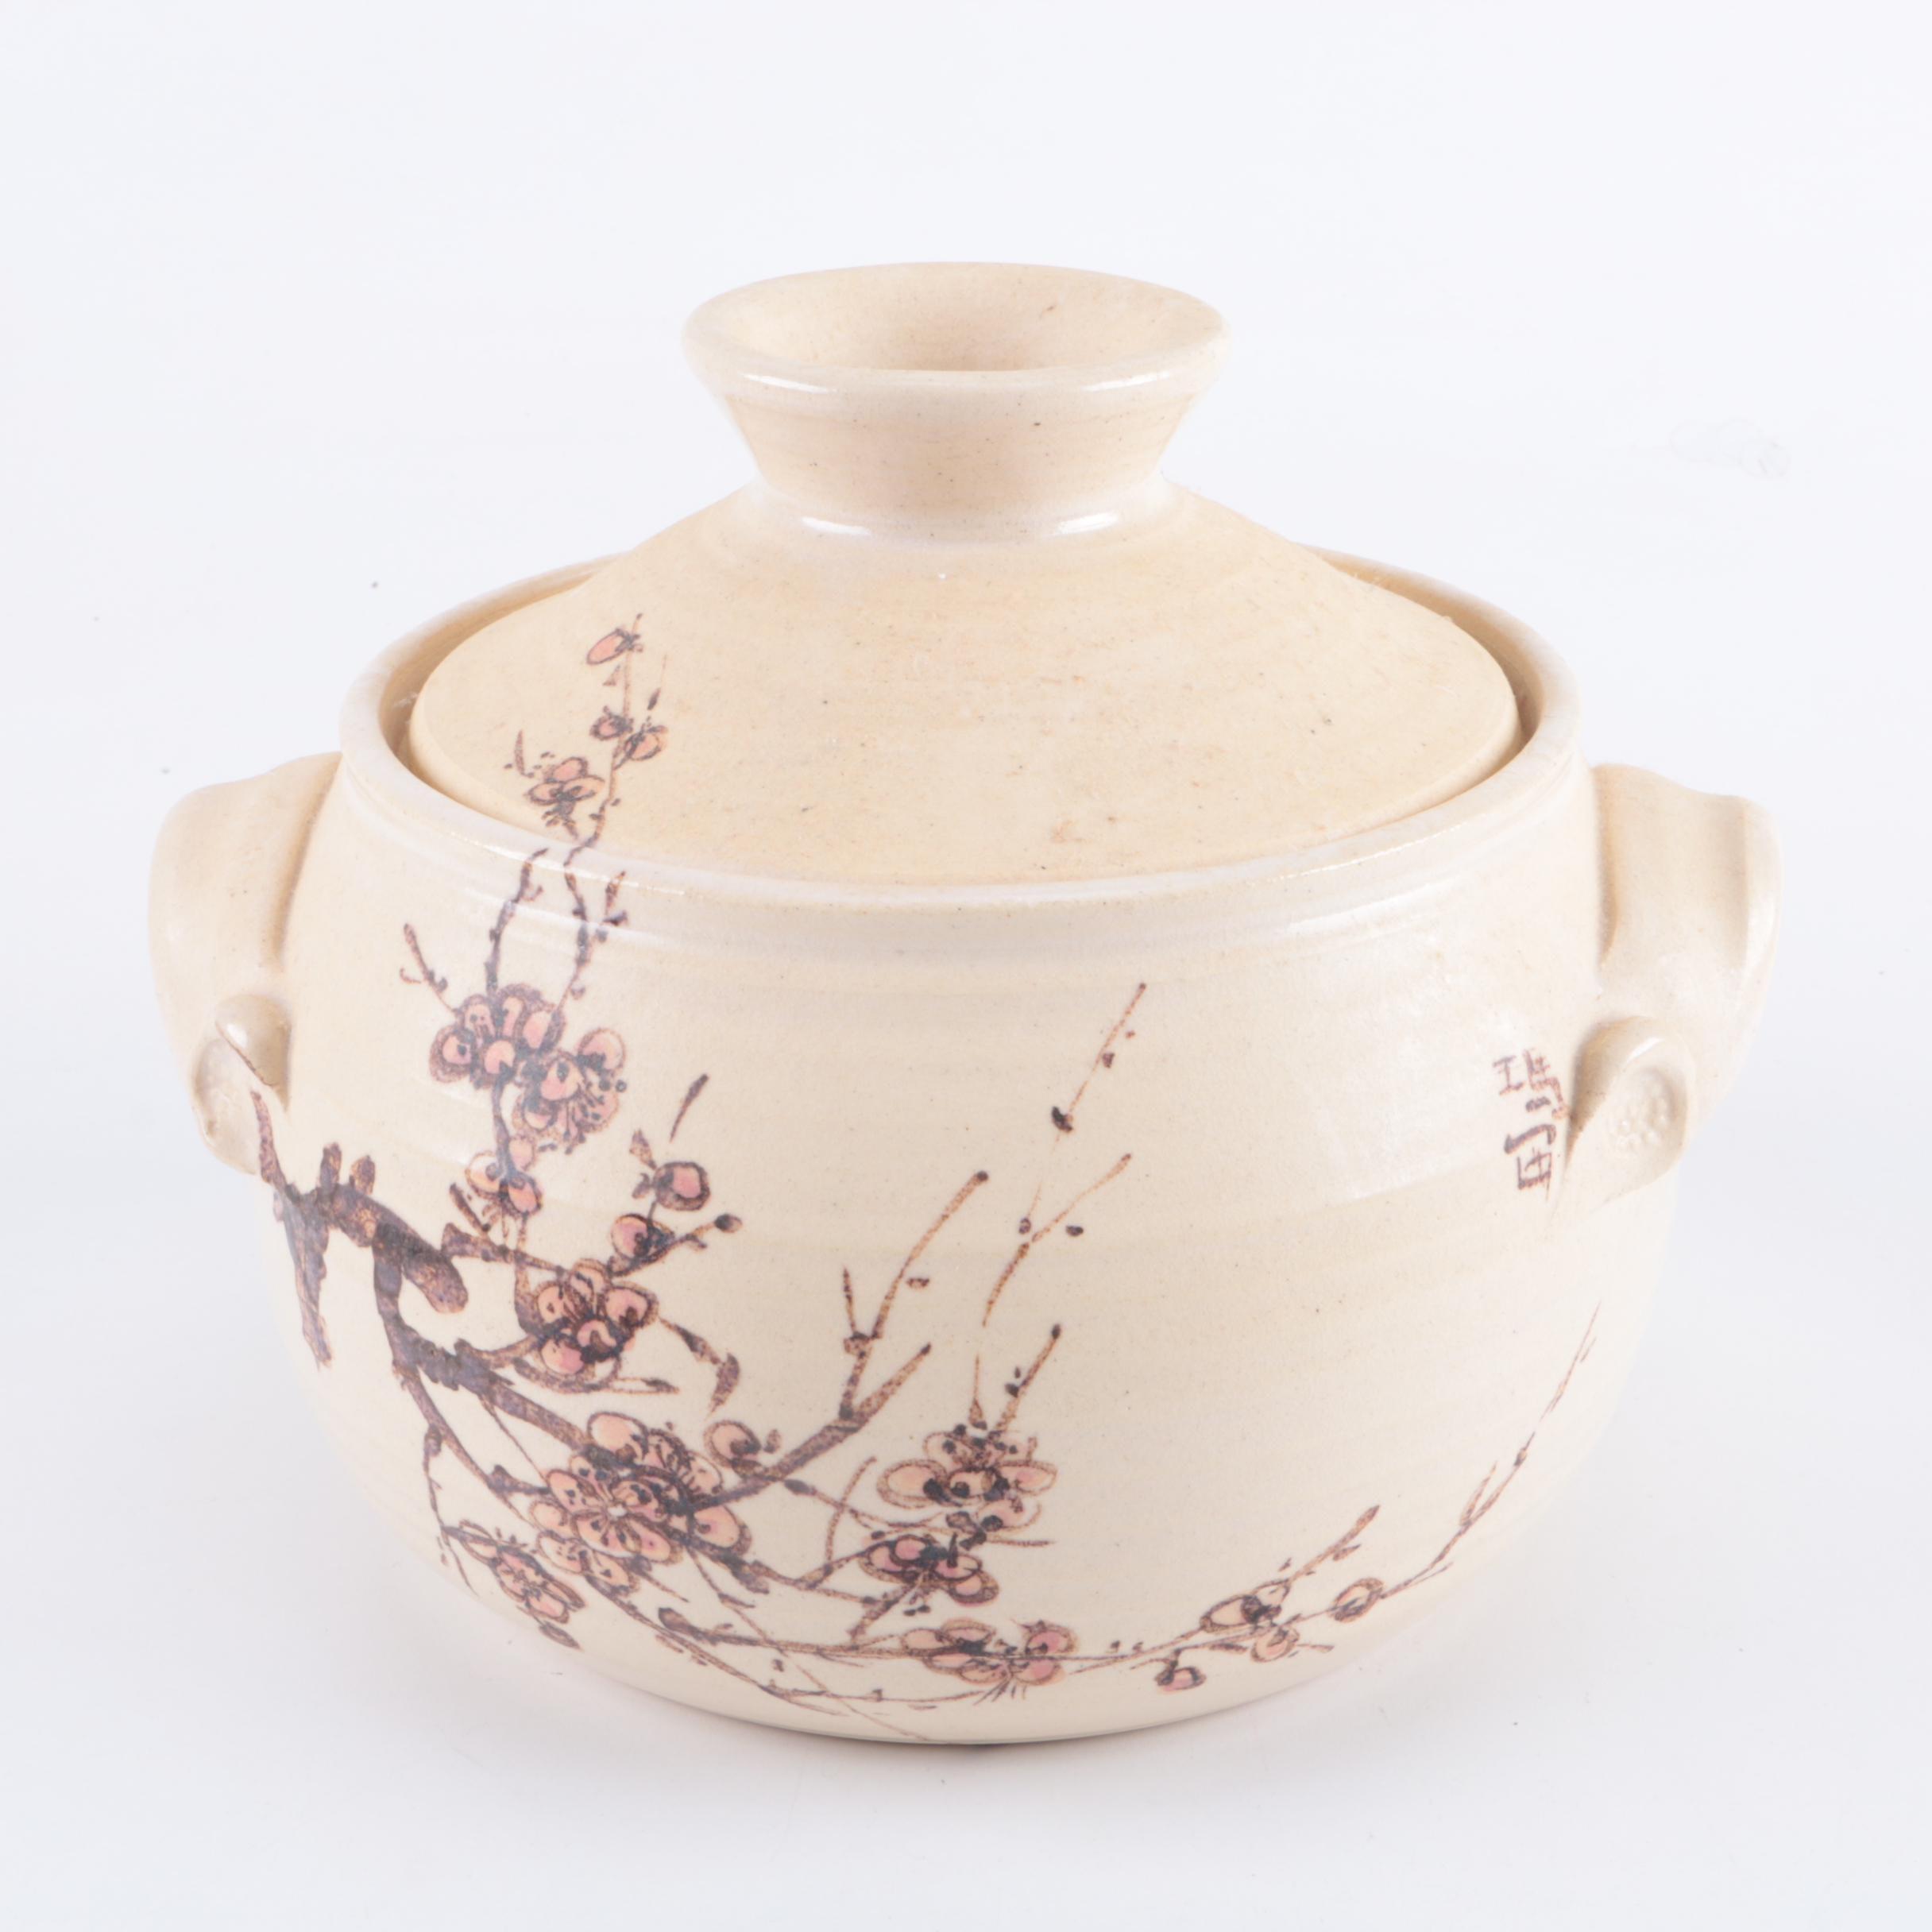 Lidded Pottery Dish